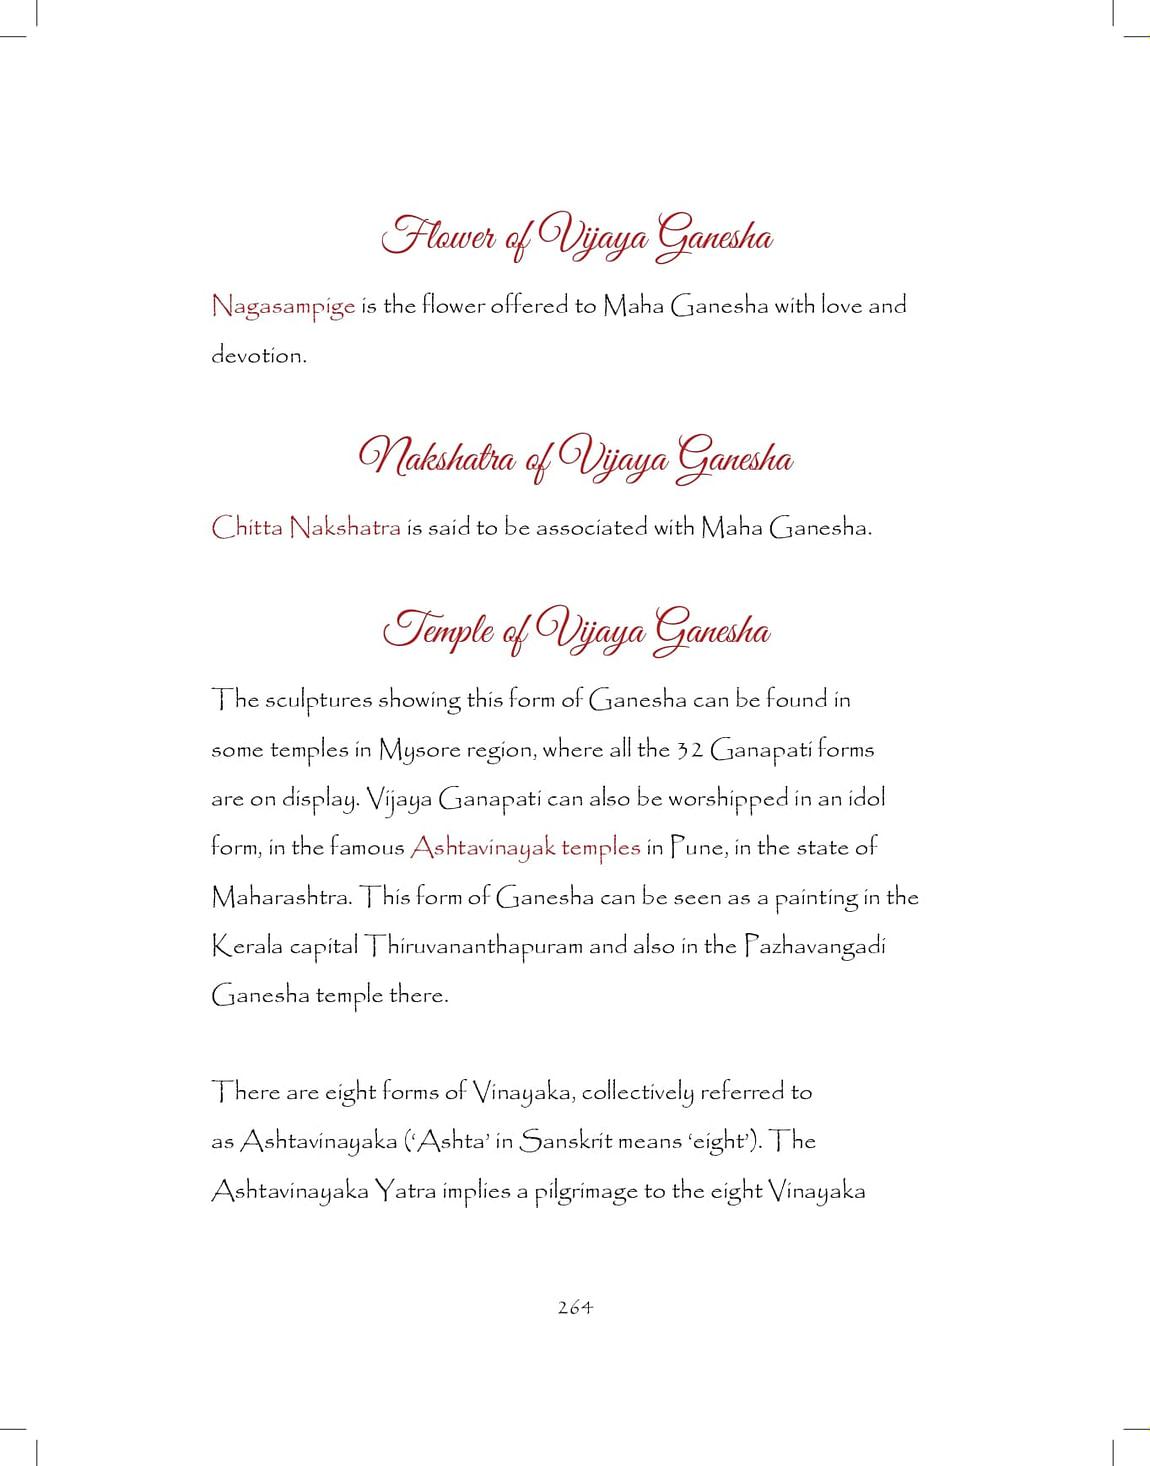 Ganesh-print_pages-to-jpg-0264.jpg